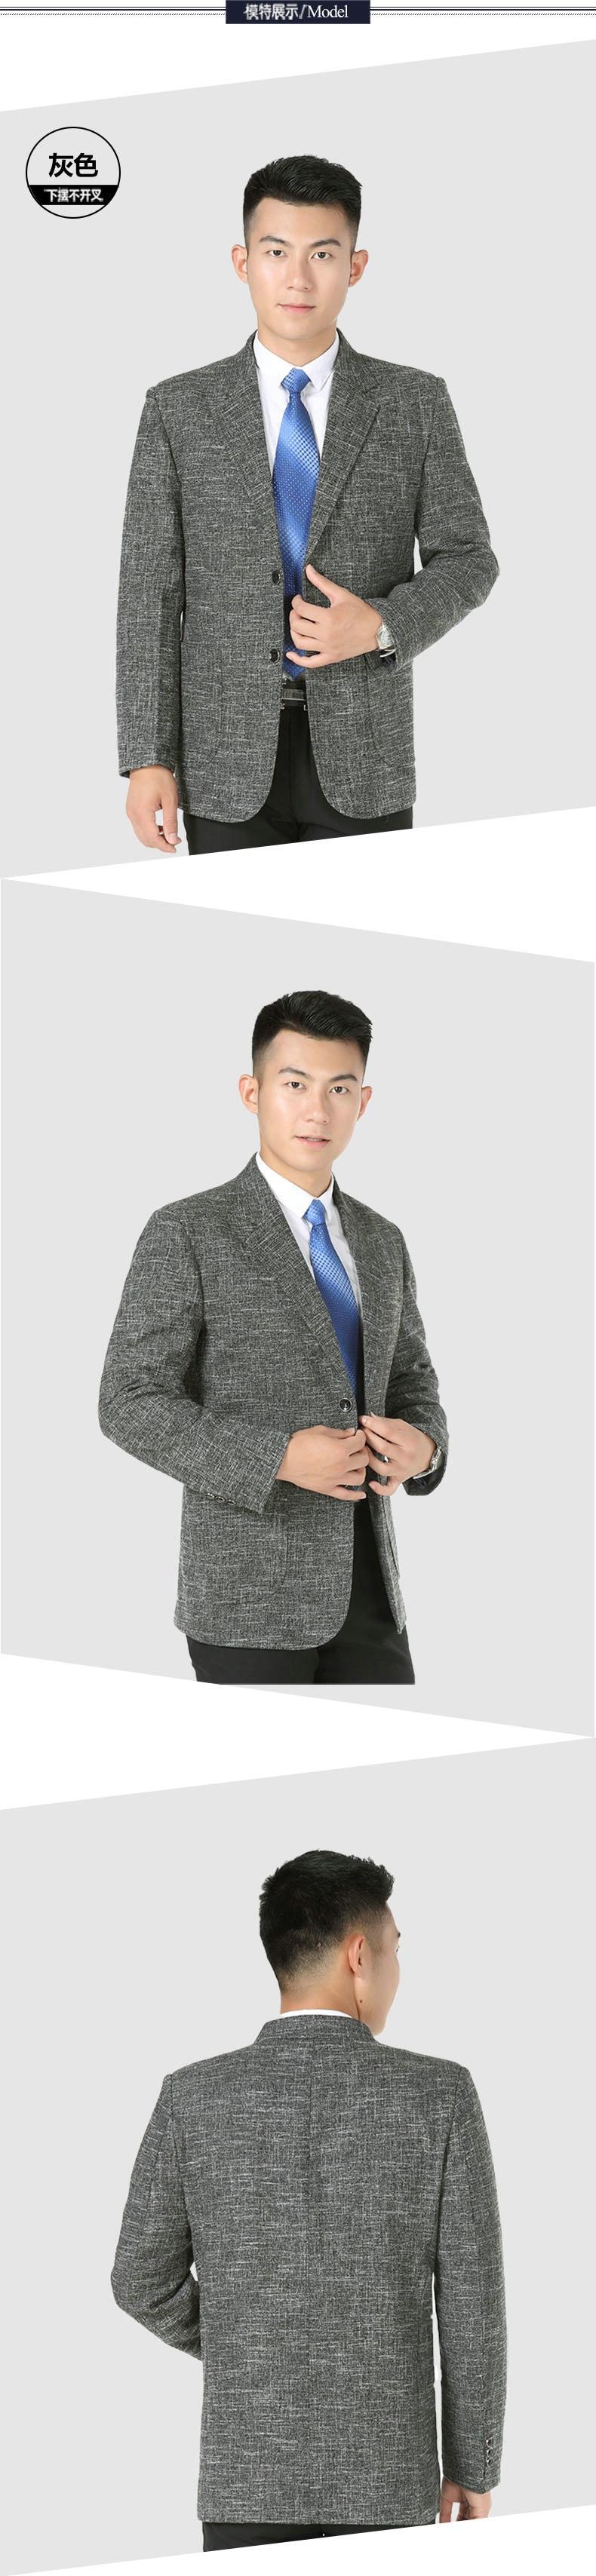 WAEOLSA Men Elegance Blazers Gray Red Khaki Suit Jackets Man Notched Collar Outfits Business Casual Blazer Male Office Suit Jacket Plus Size Wear (4)